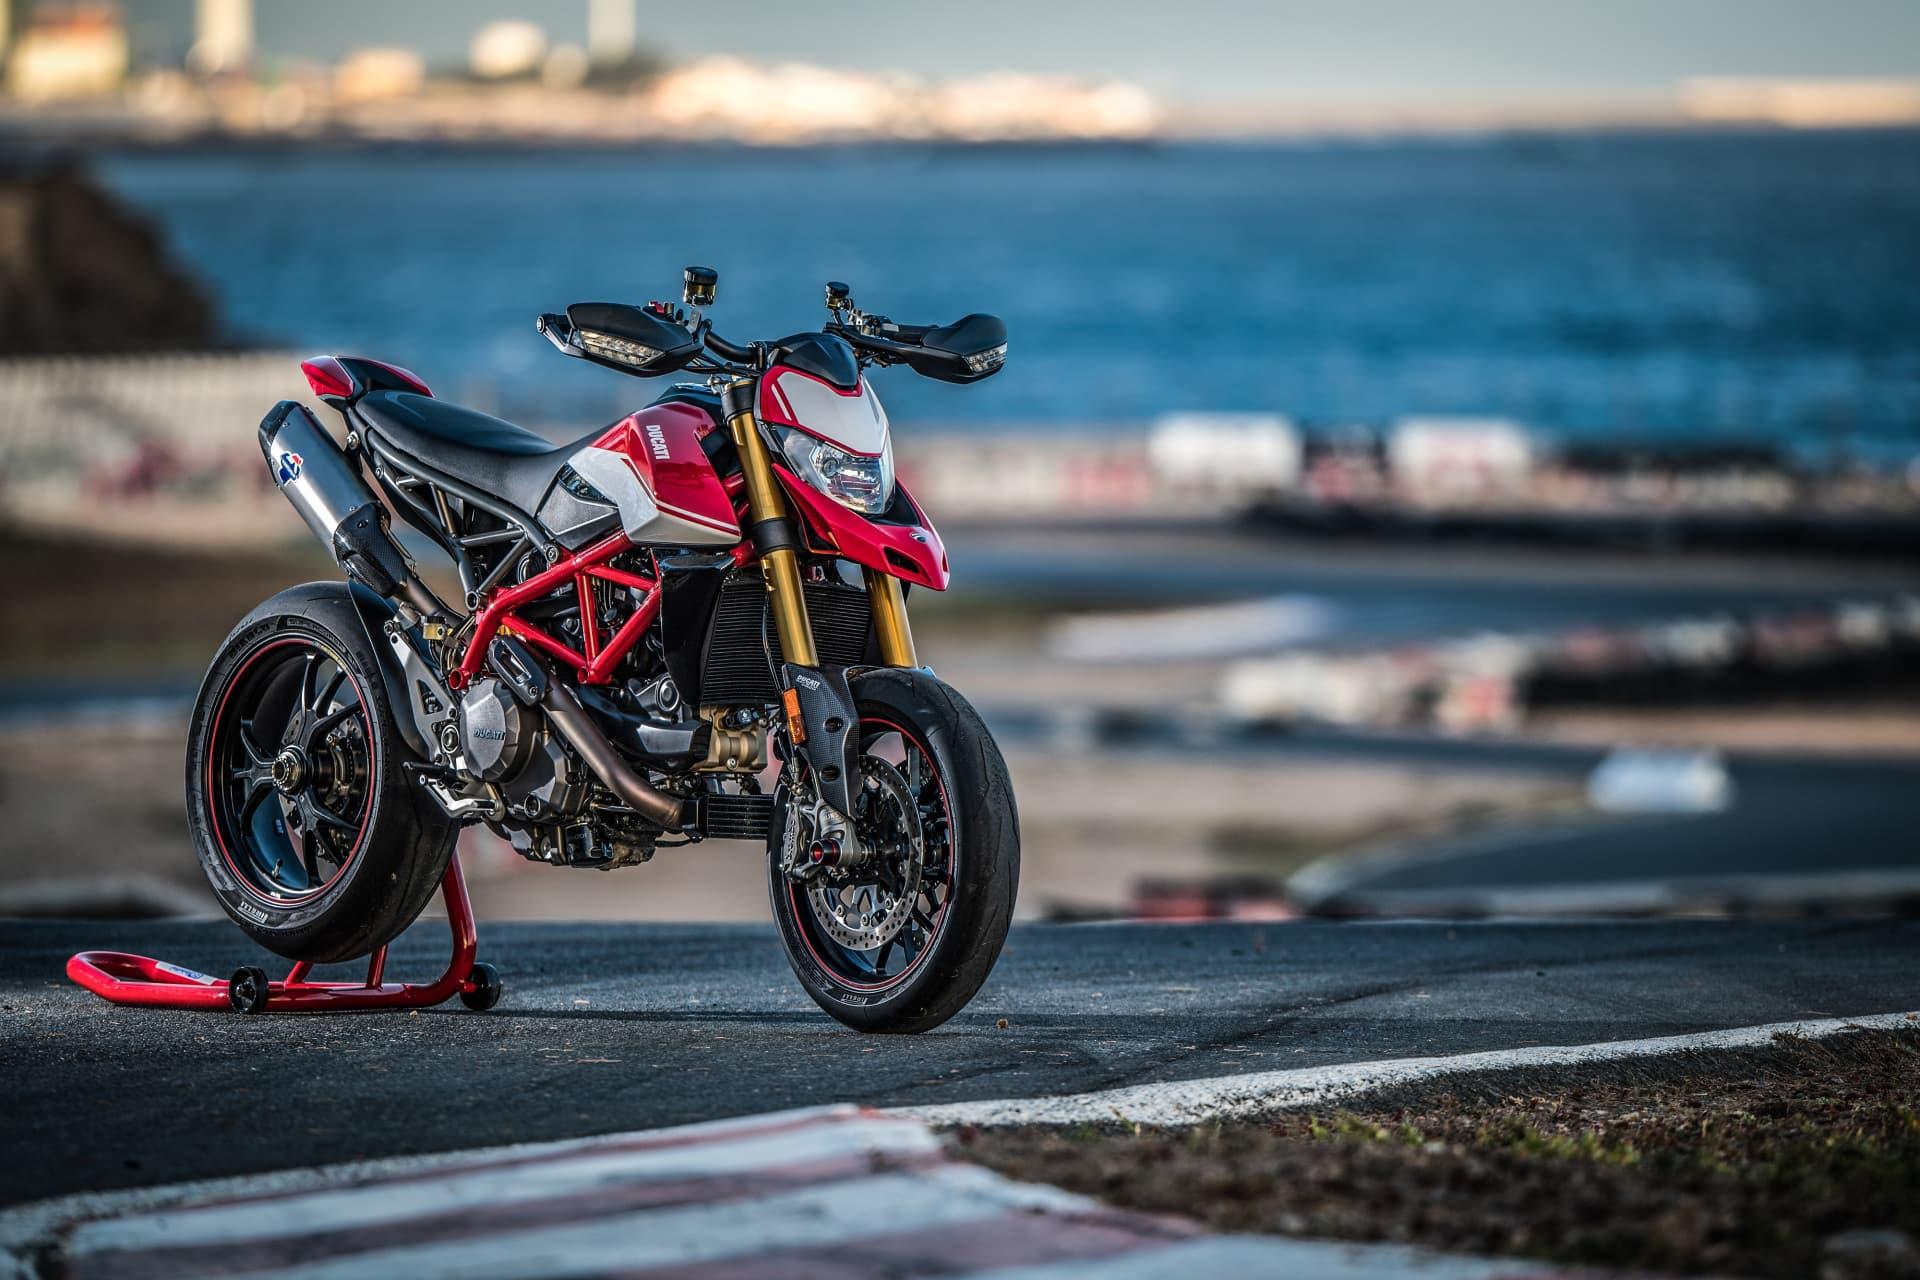 Ducati Hypermotard 950 Sp Static 07 Uc70307 Mid